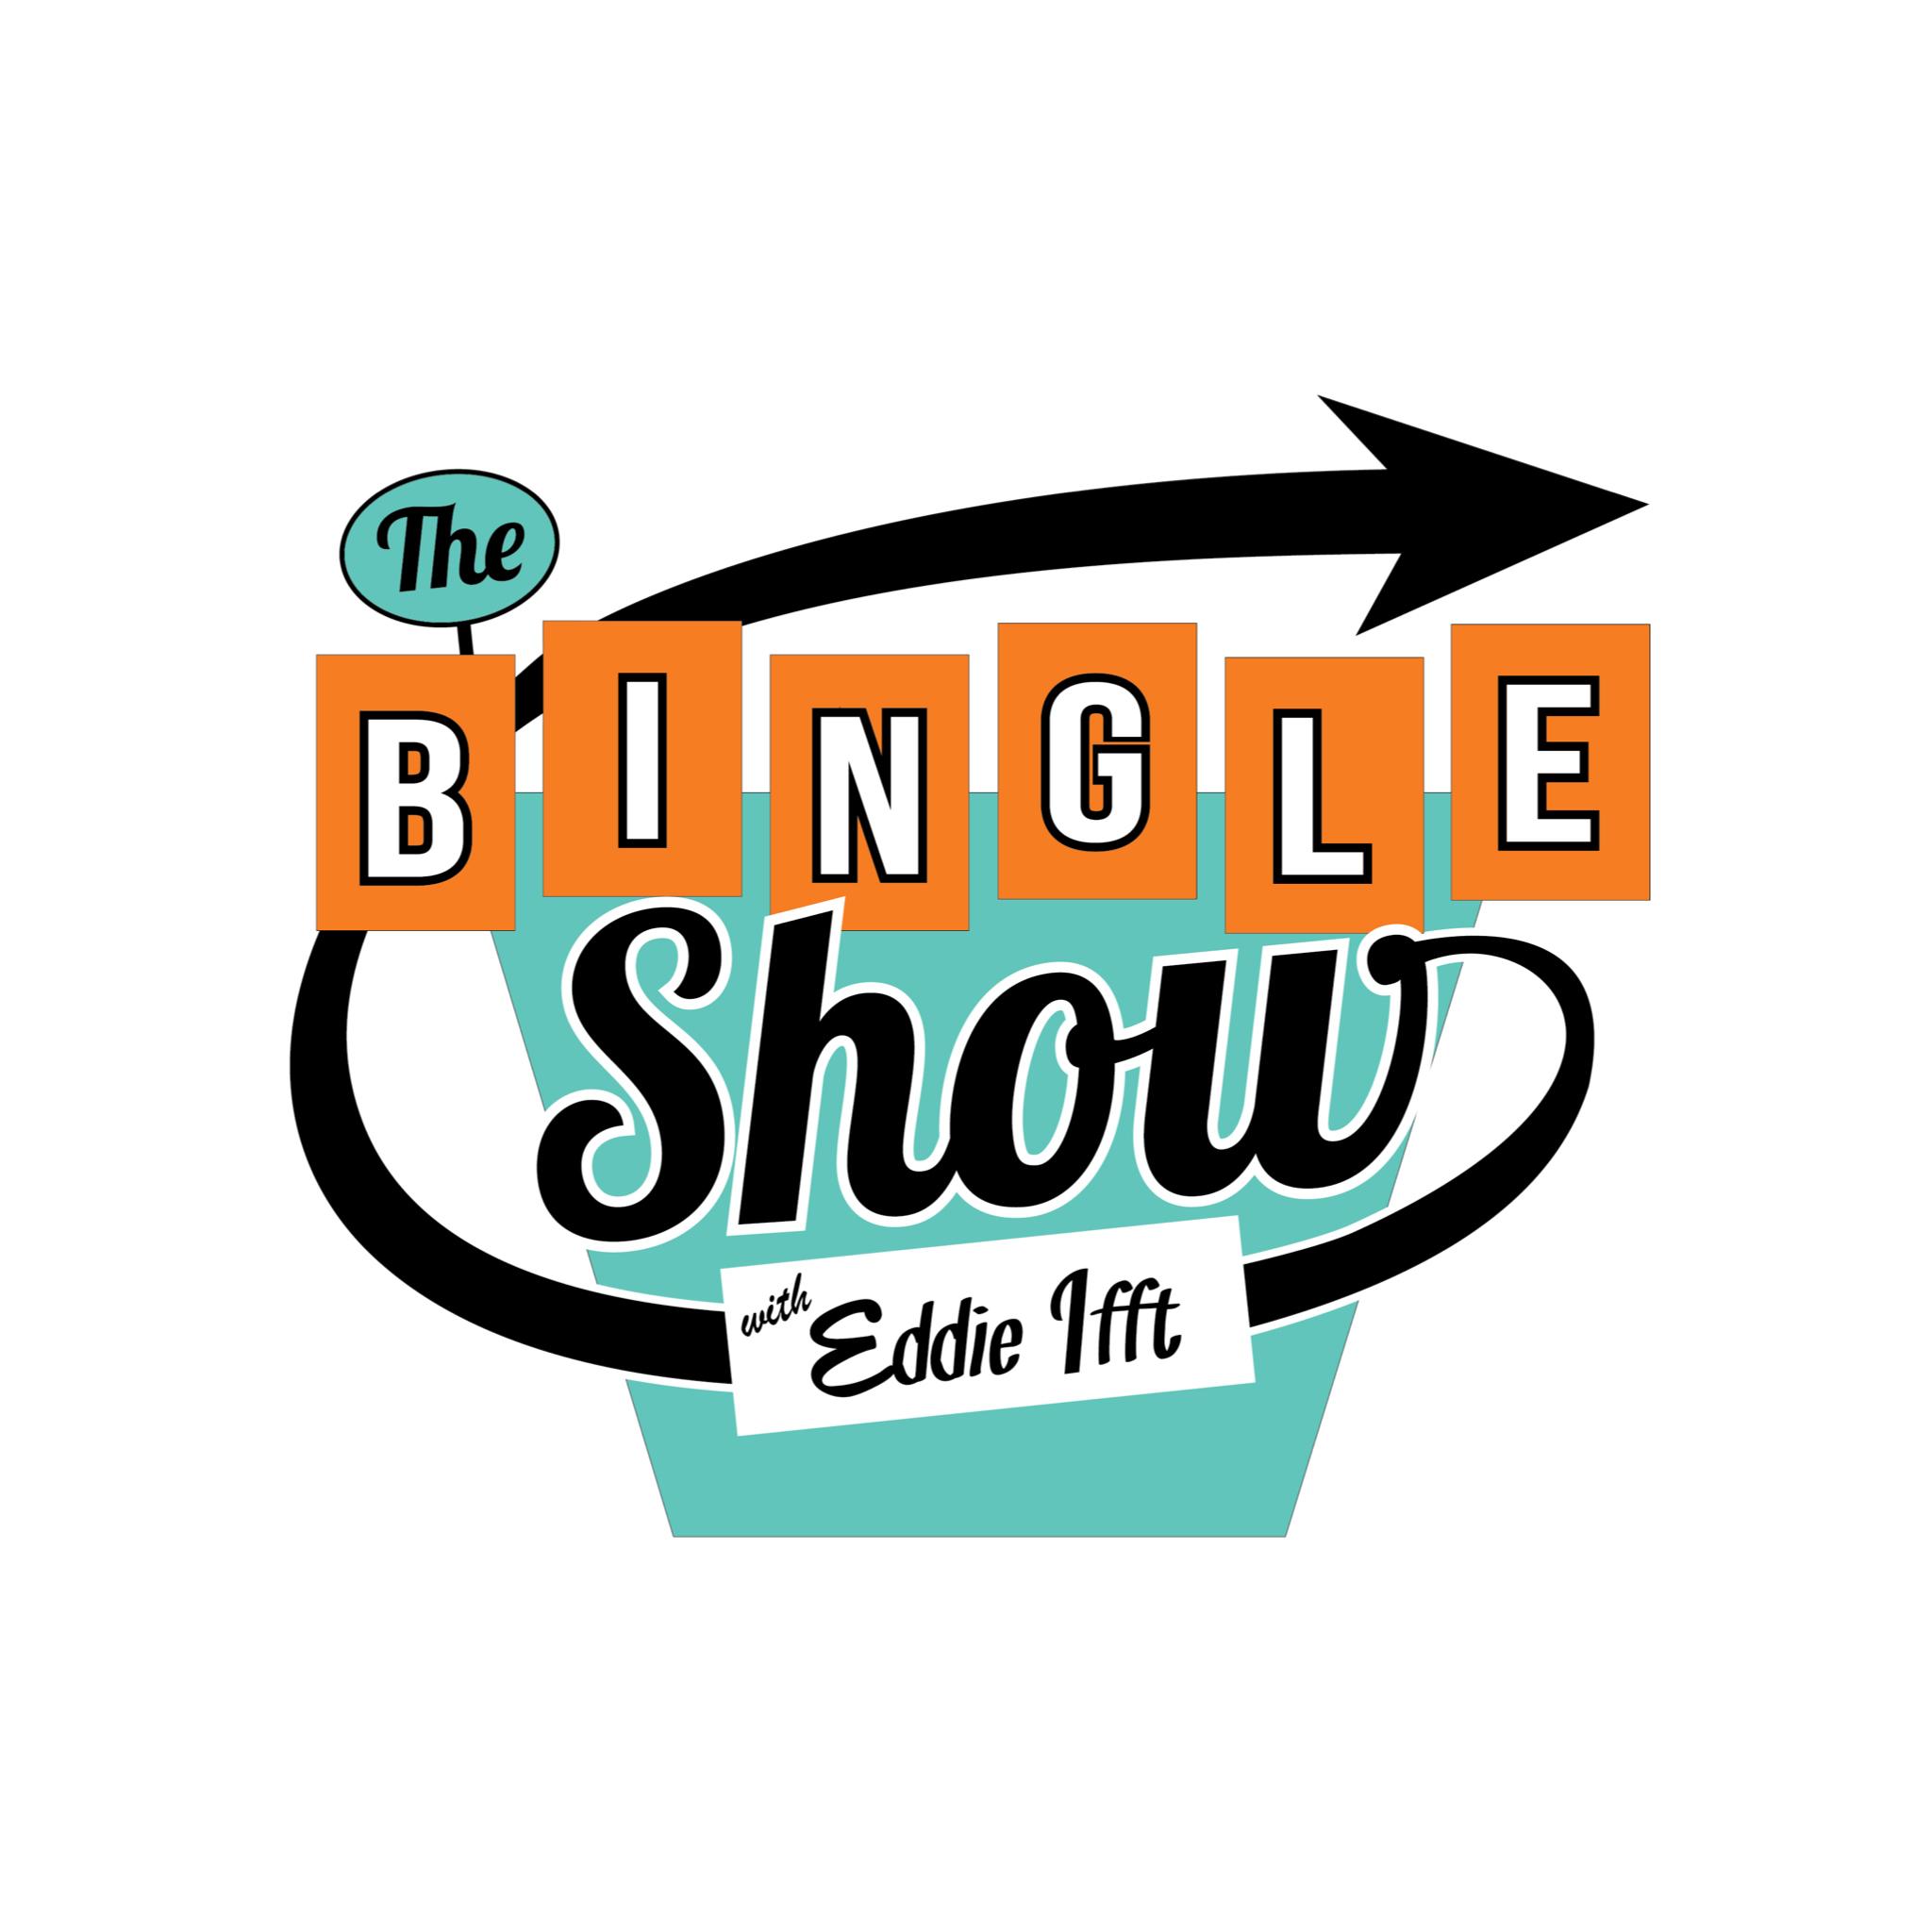 The Bingle Show show art